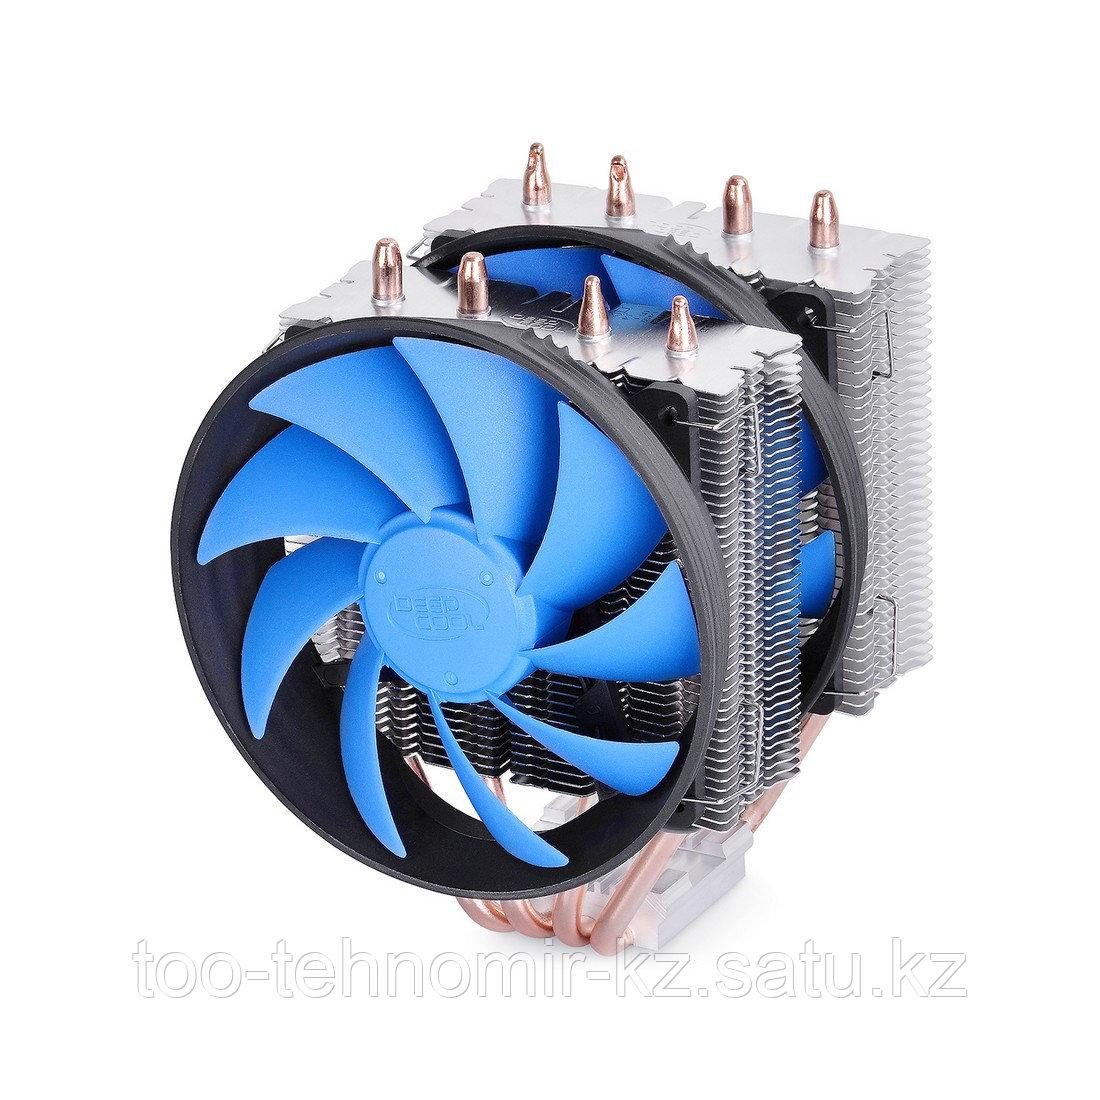 Вентилятор Soc-2011/1366/1156/1155/1151 Deepcool FROSTIN V2.0